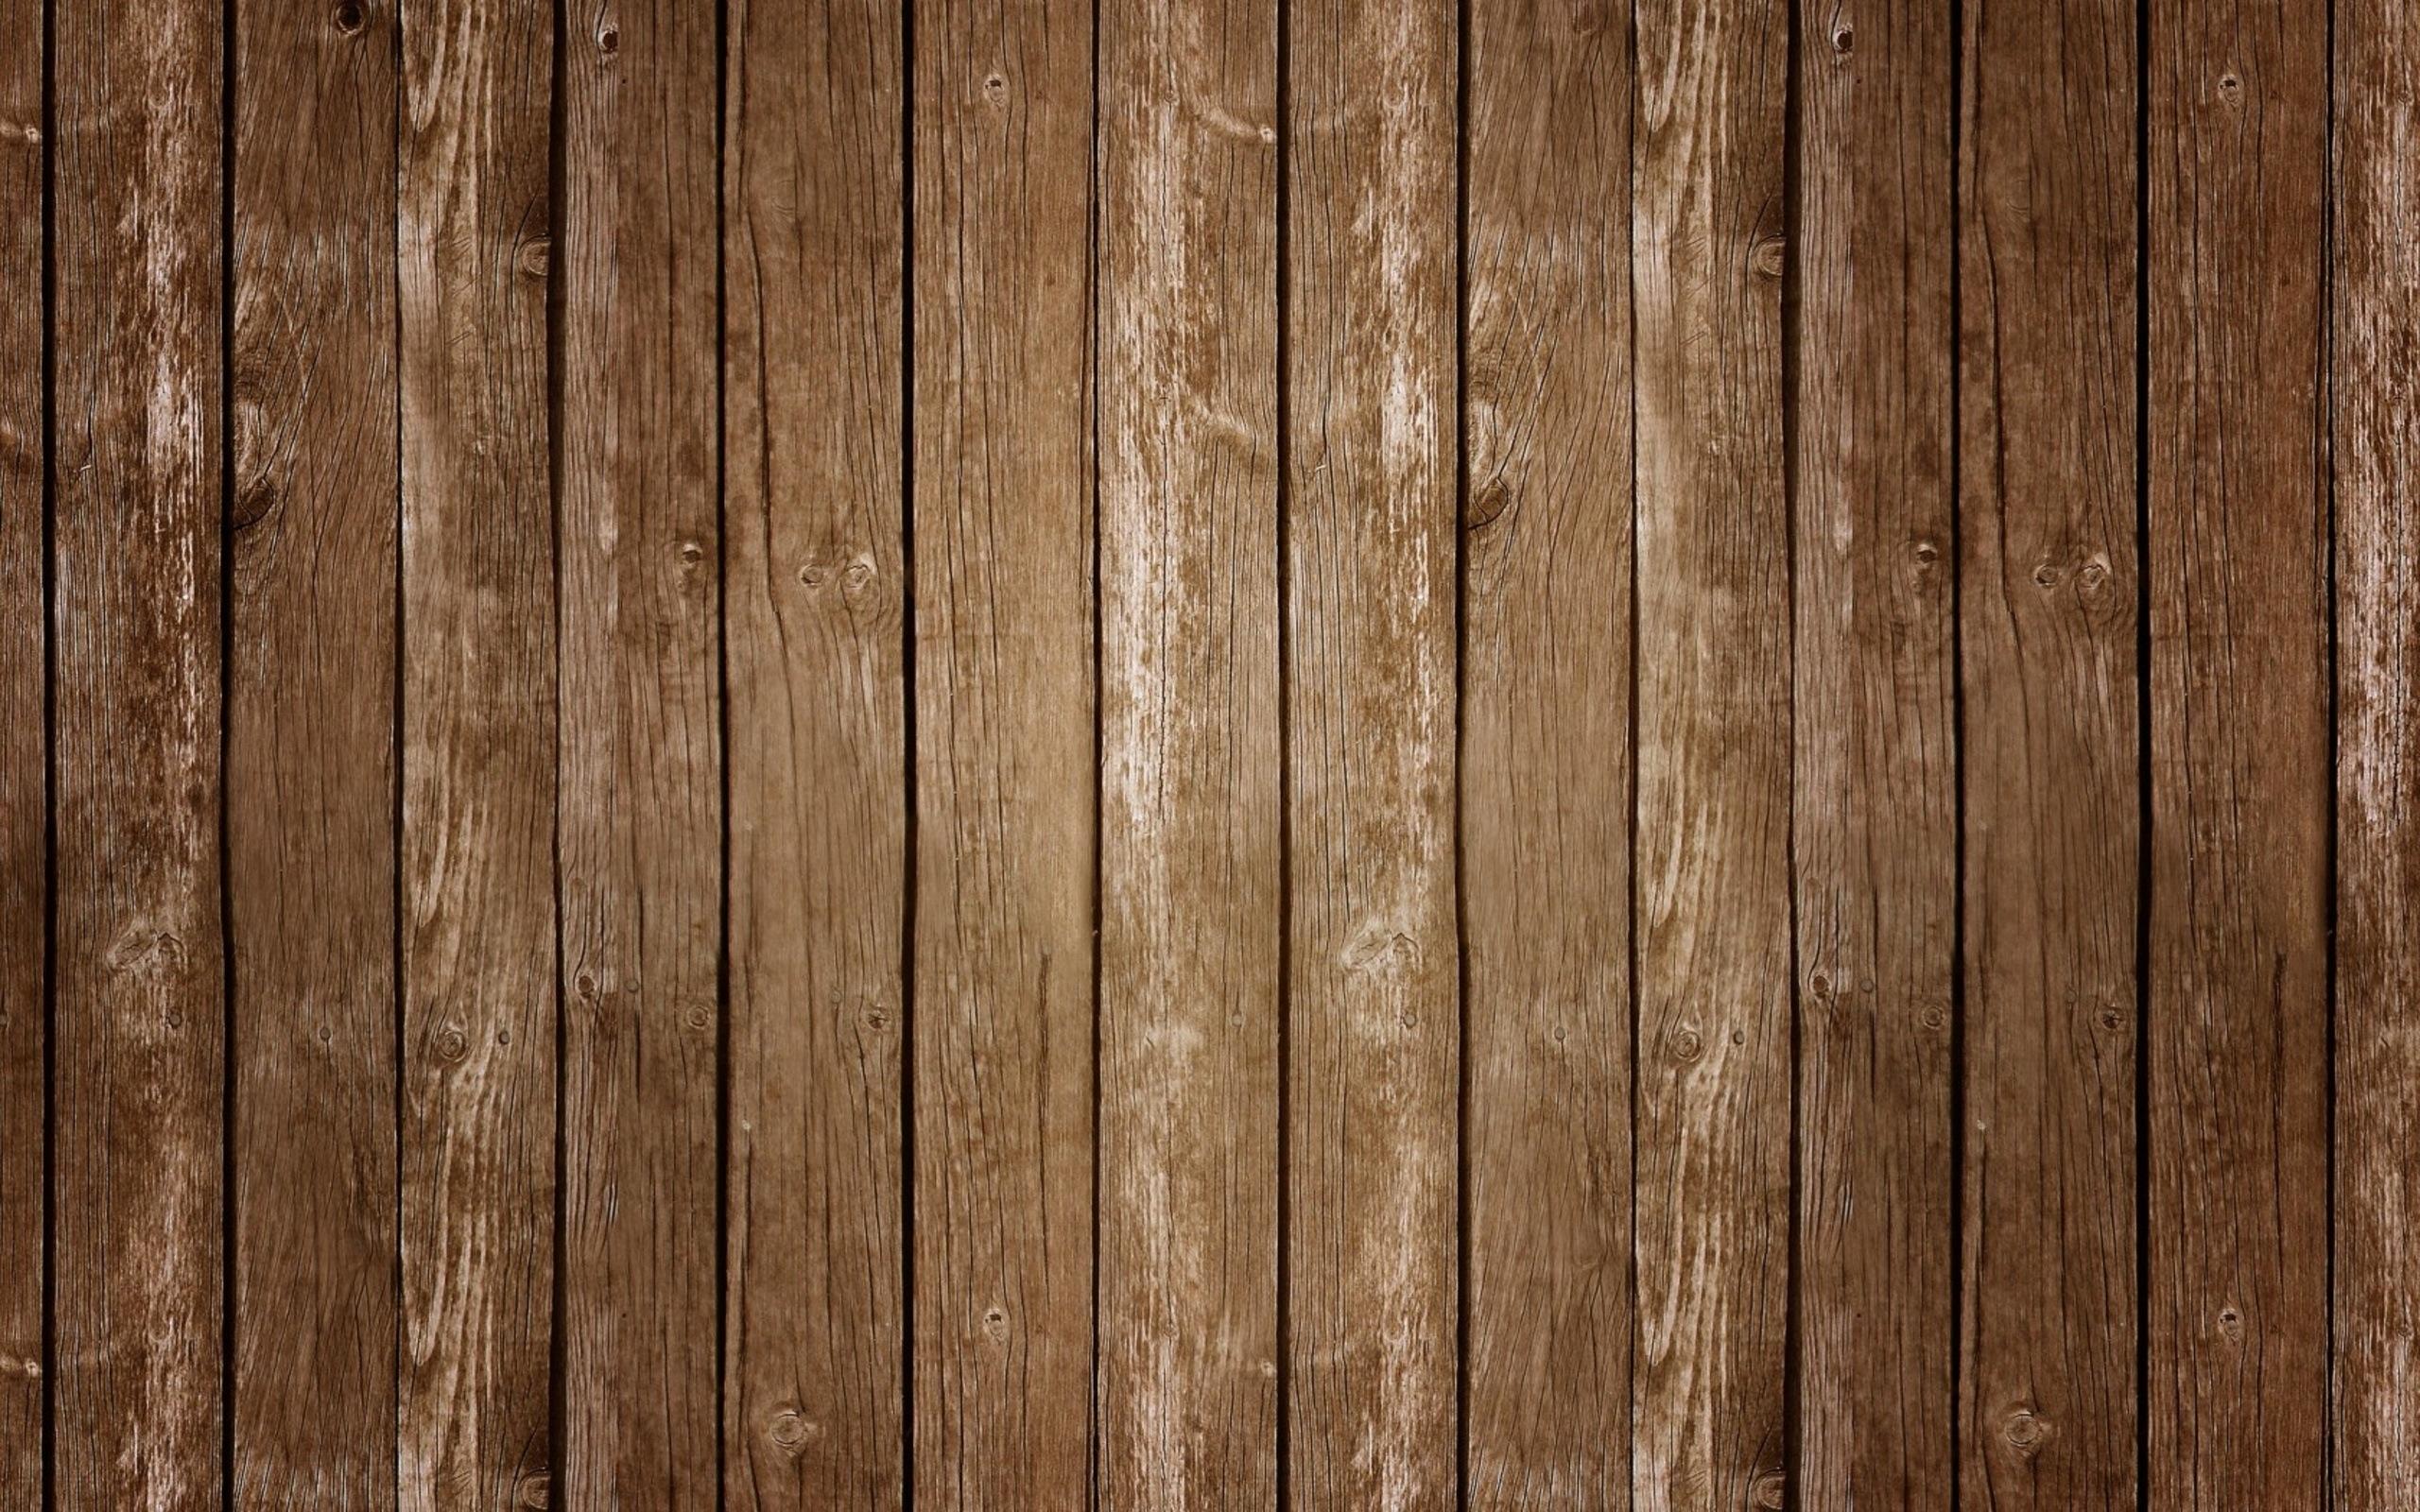 Wood Grain Background Free.